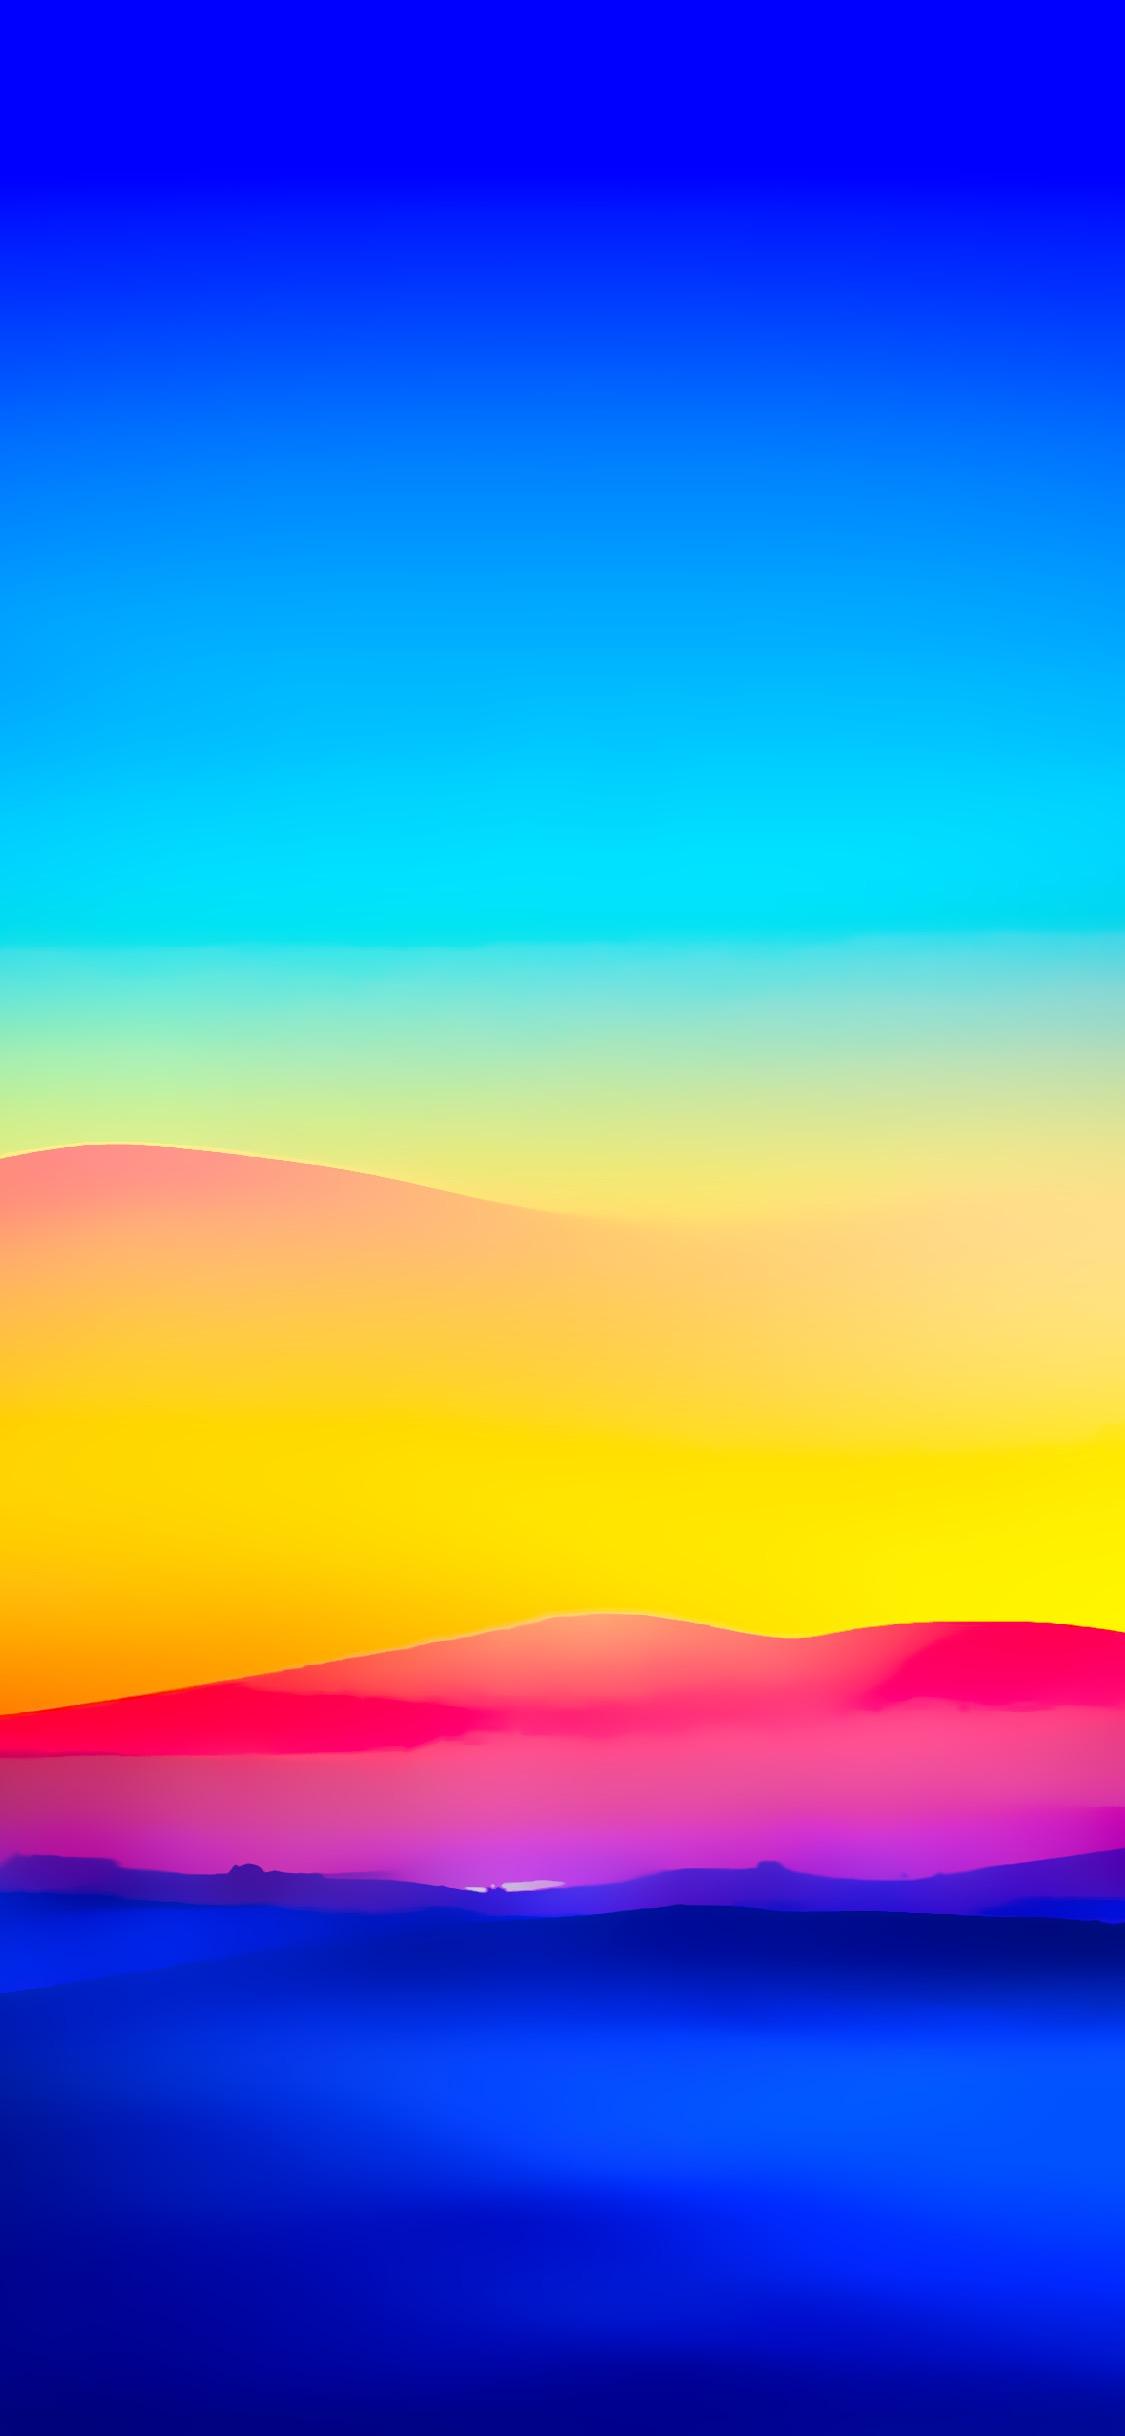 Nintendo Wallpaper Iphone X Vivid Colors Iphone Wallpaper Pack